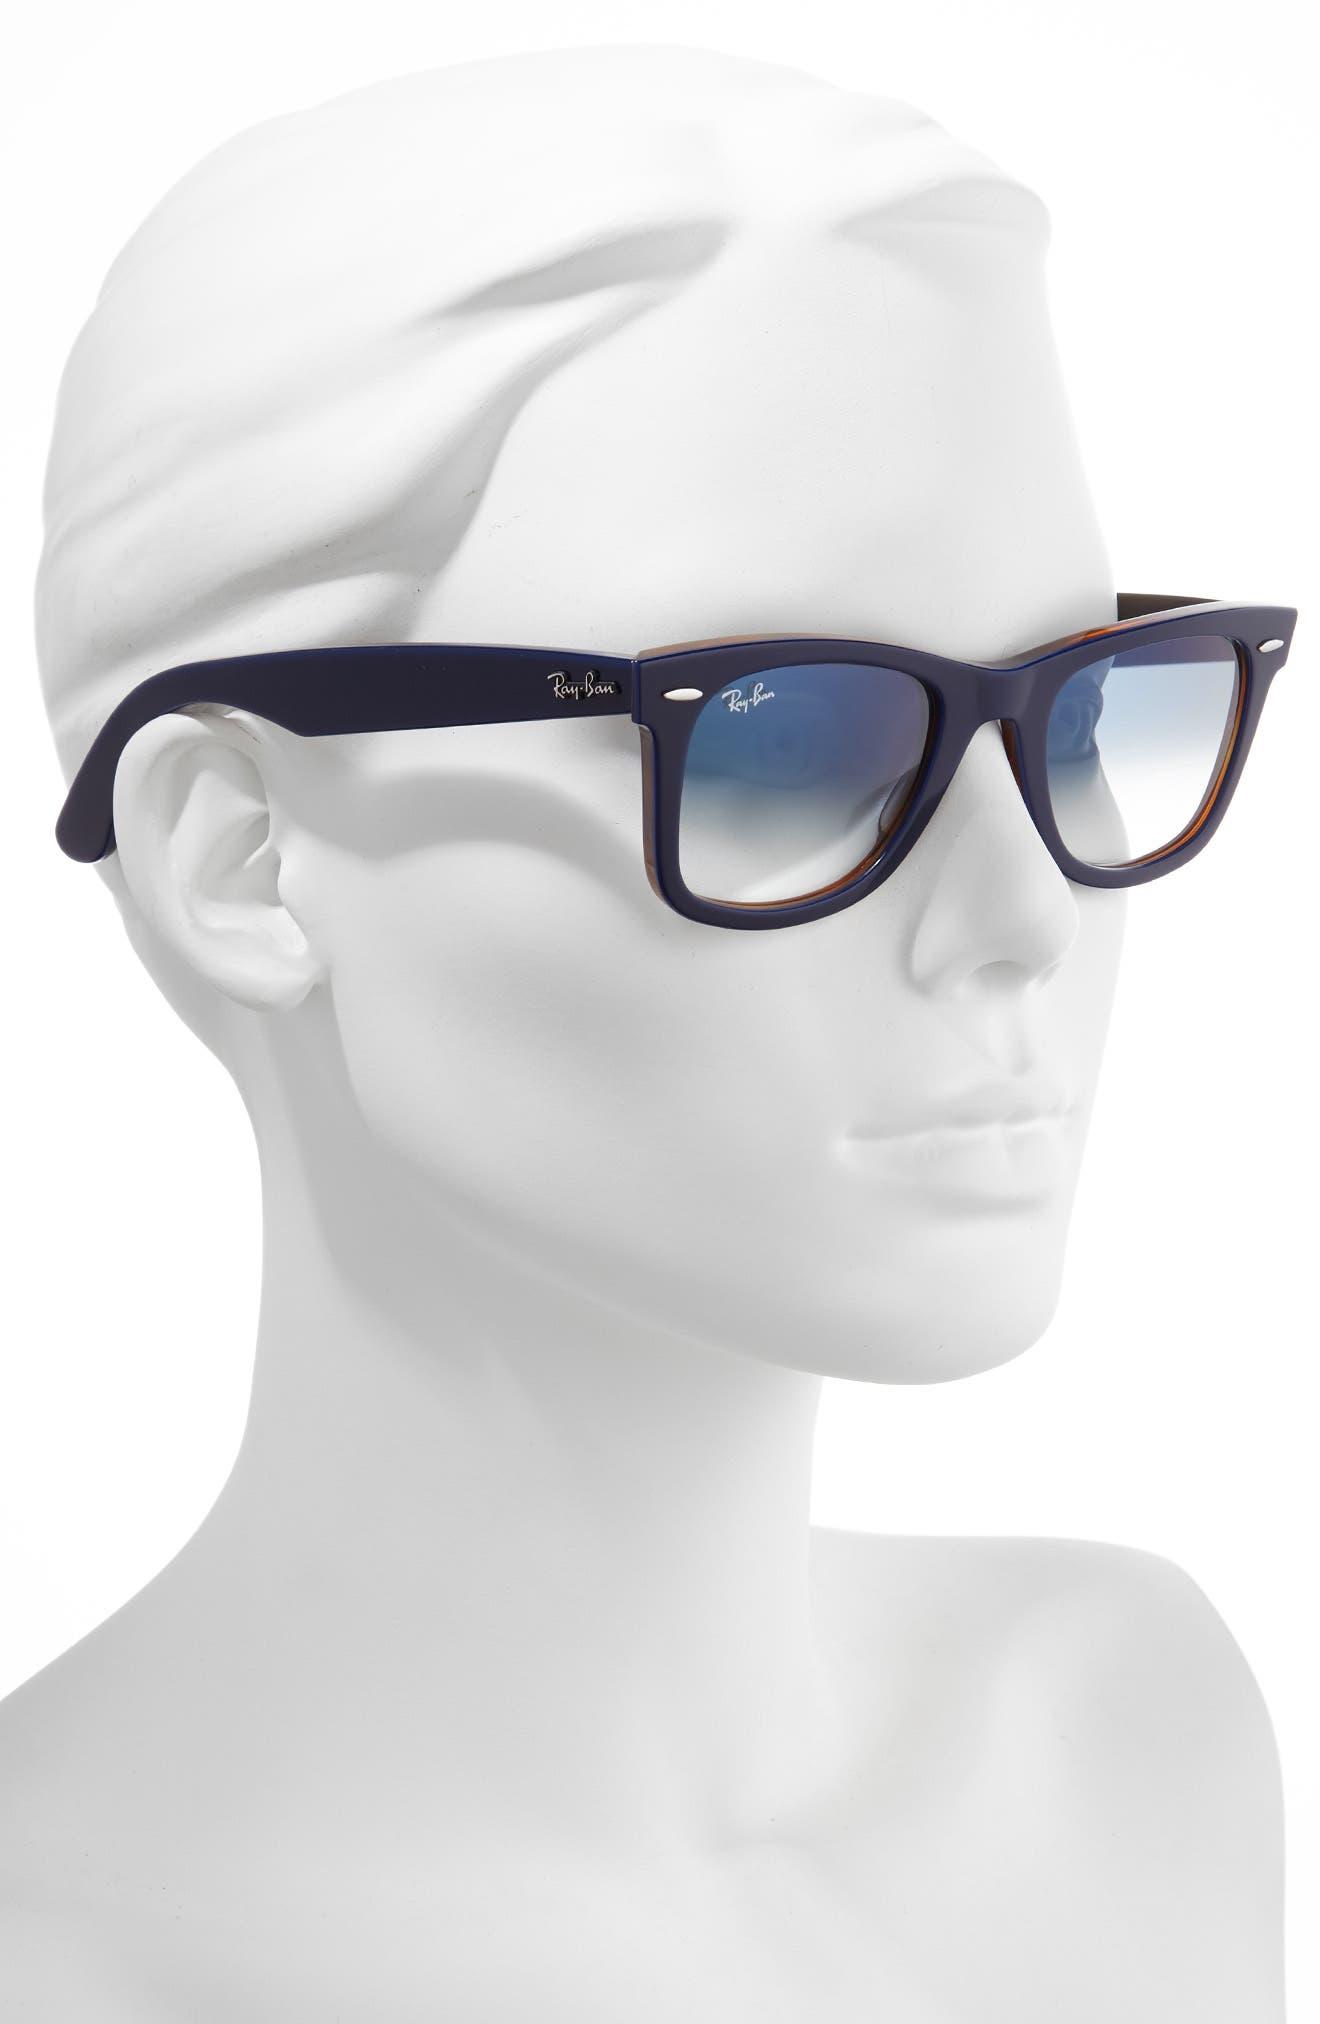 ec0fc6e5f19 Ray-Ban Wayfarer Sunglasses